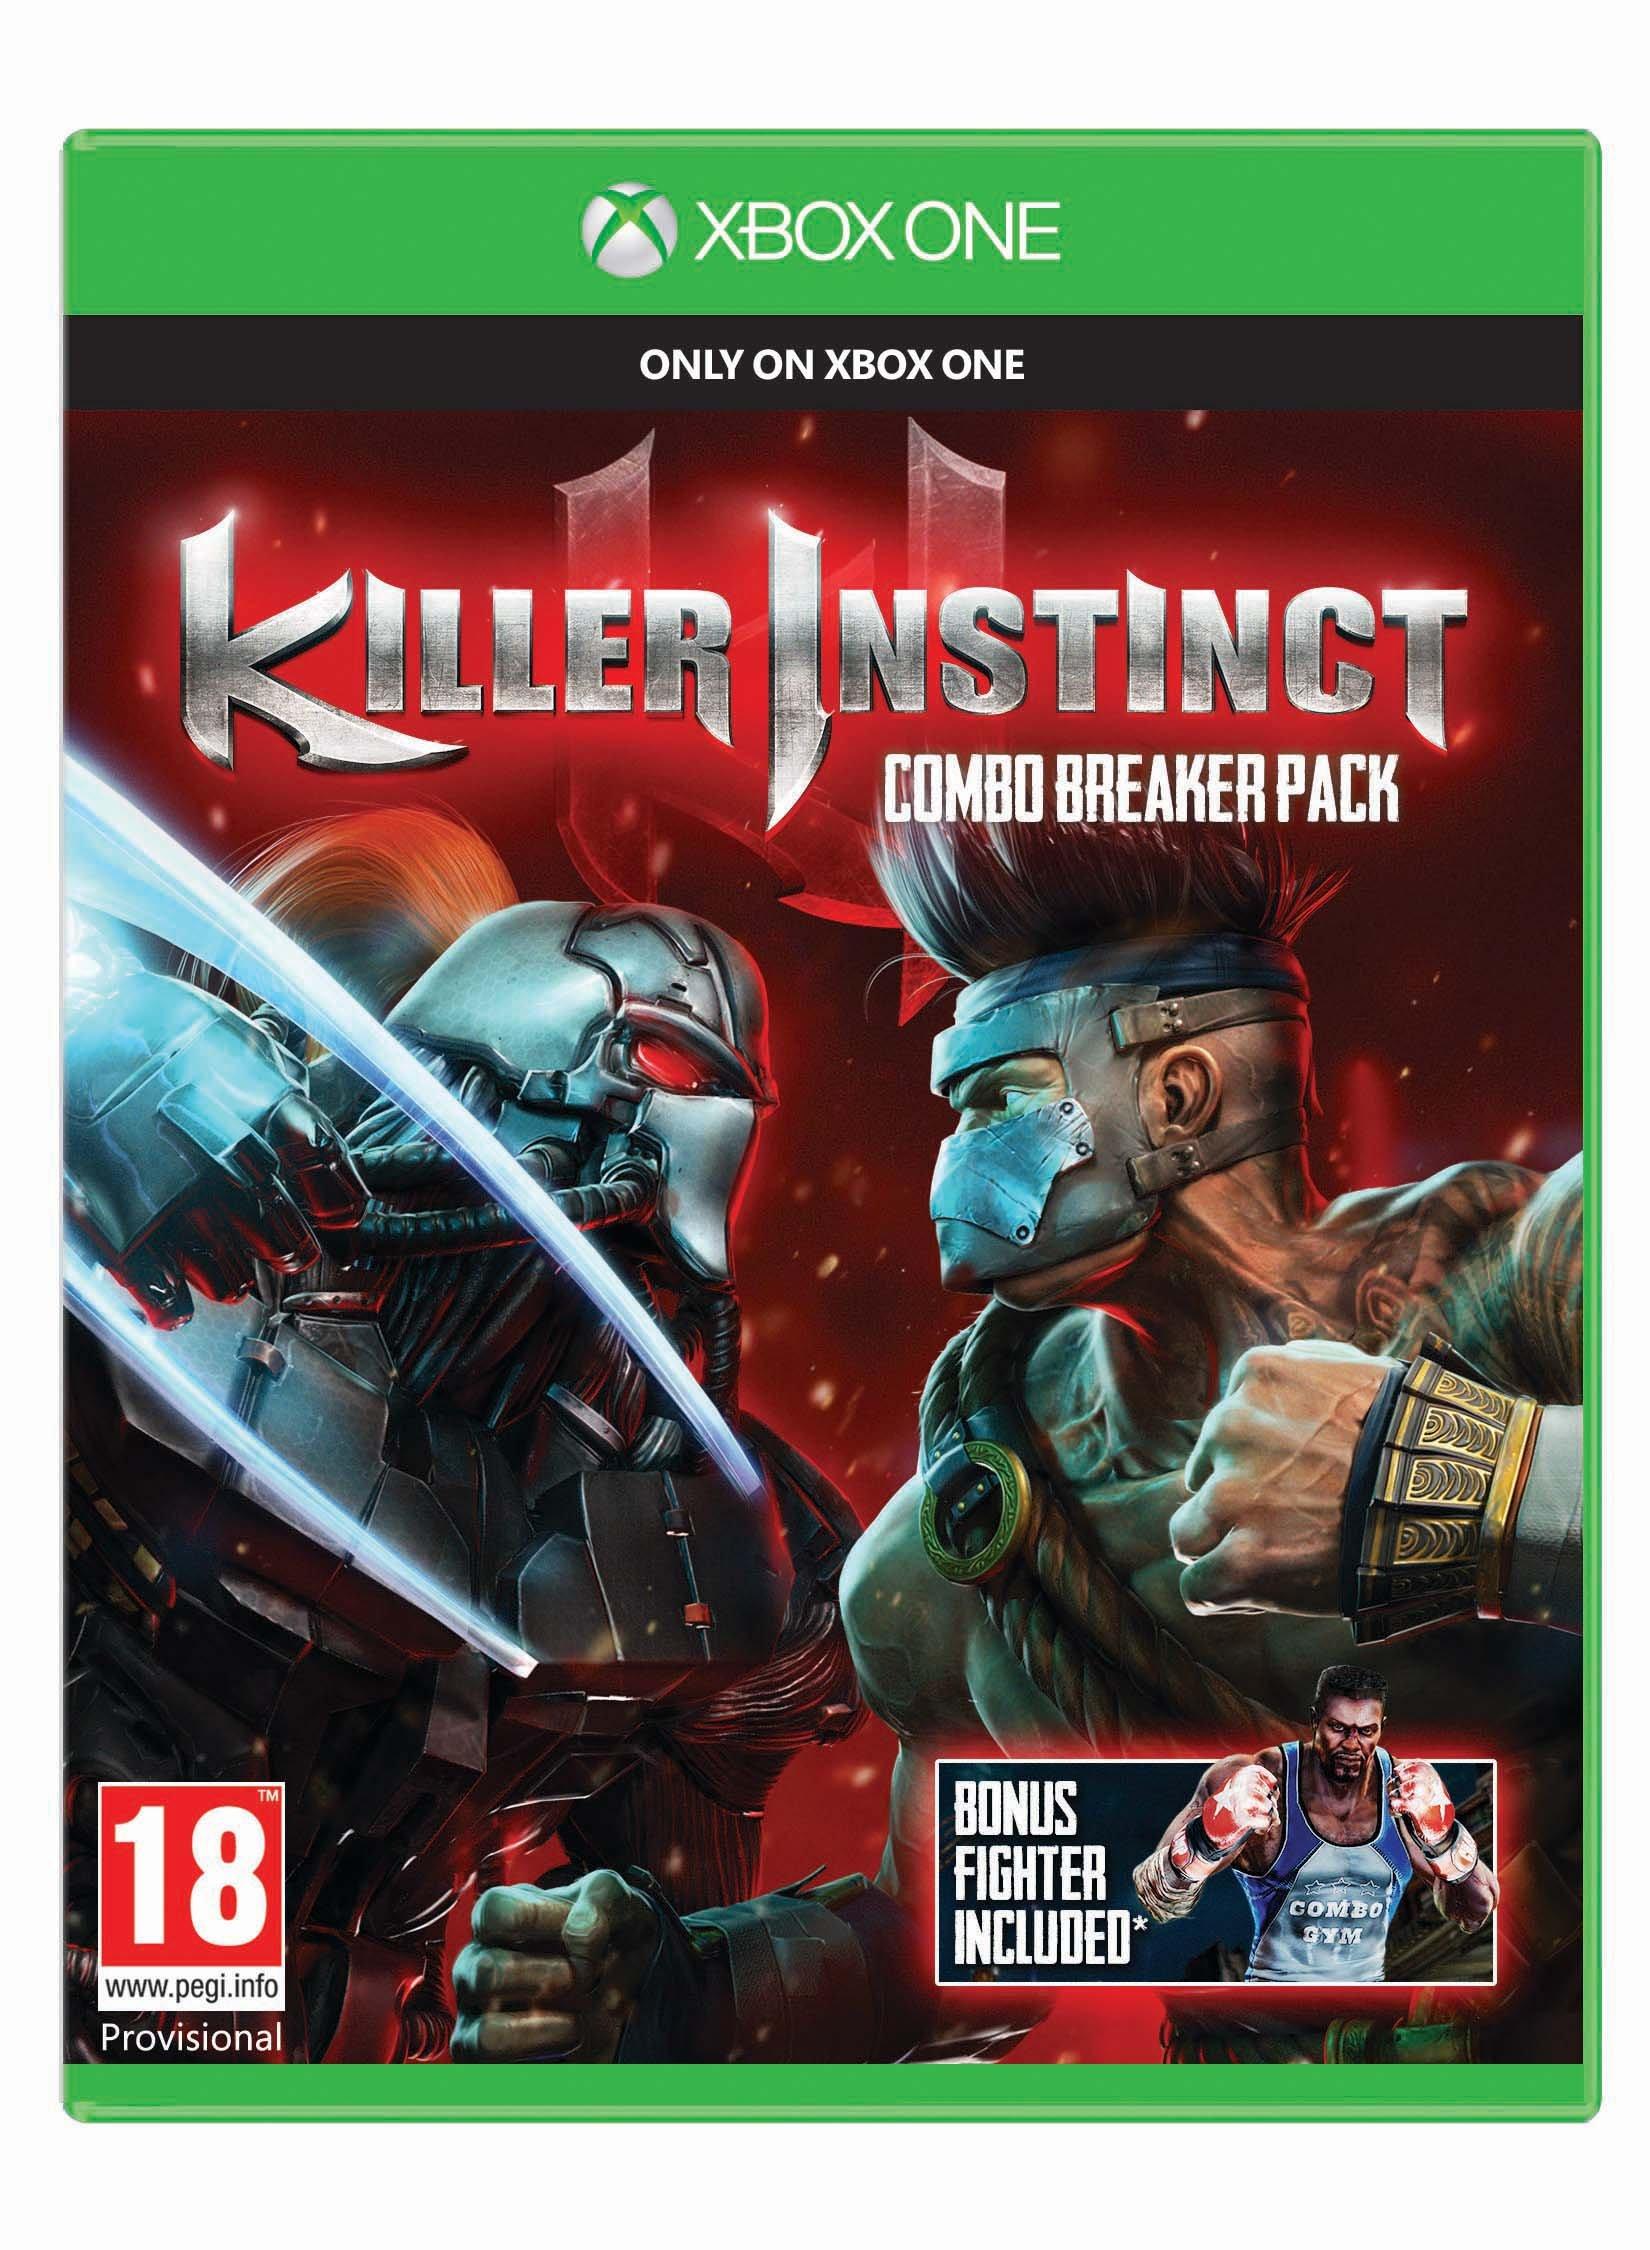 Microsoft Killer Instinct, Xbox One Básico Xbox One Inglés vídeo - Juego (Xbox One, Básico, Xbox One, Acción / Aventura, T (Teen), Inglés, Iron Galaxy): Amazon.es: Videojuegos